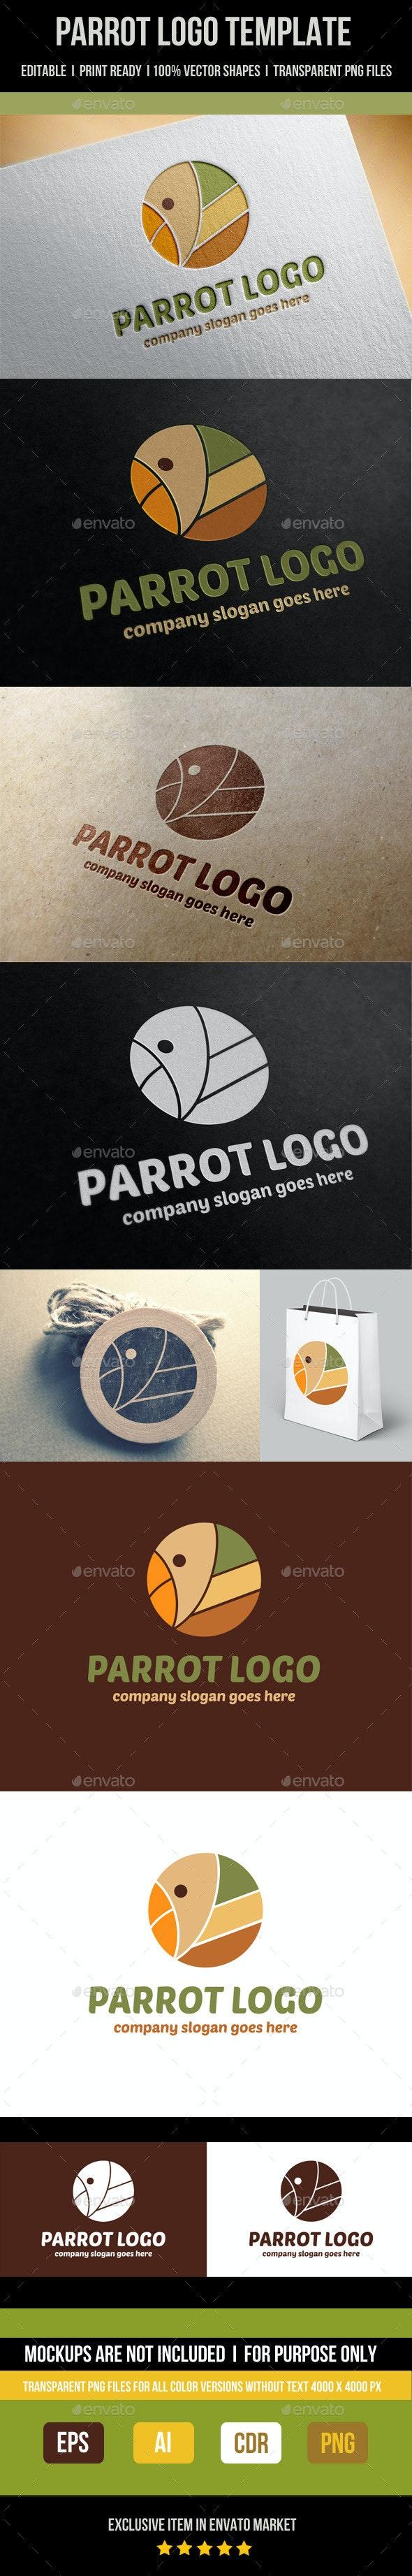 Parrot Logo Template - Abstract Logo Templates